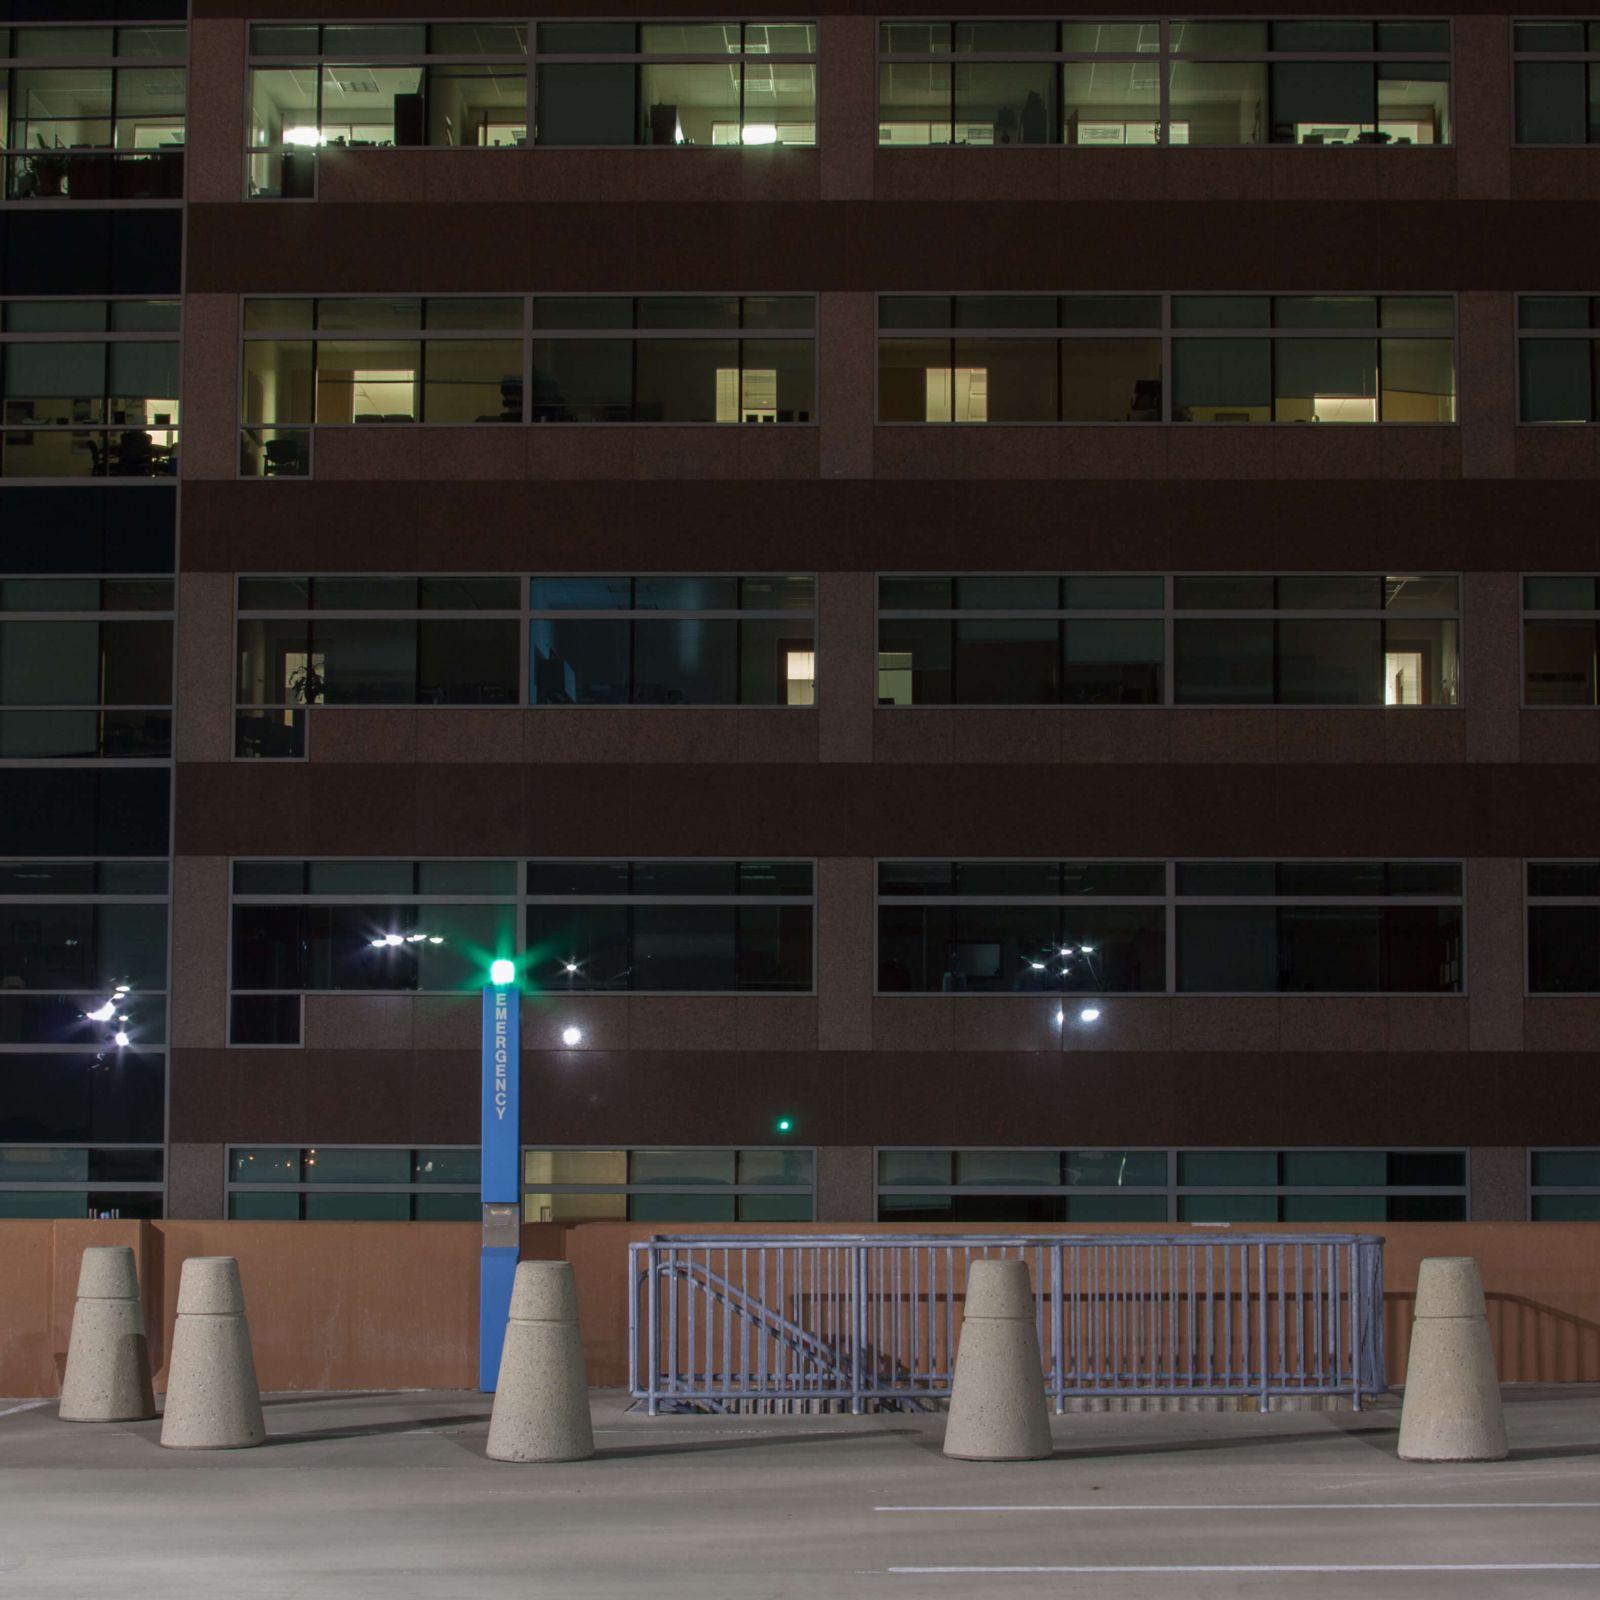 Premises Liability Attorneys Hofmann and Schweitzer